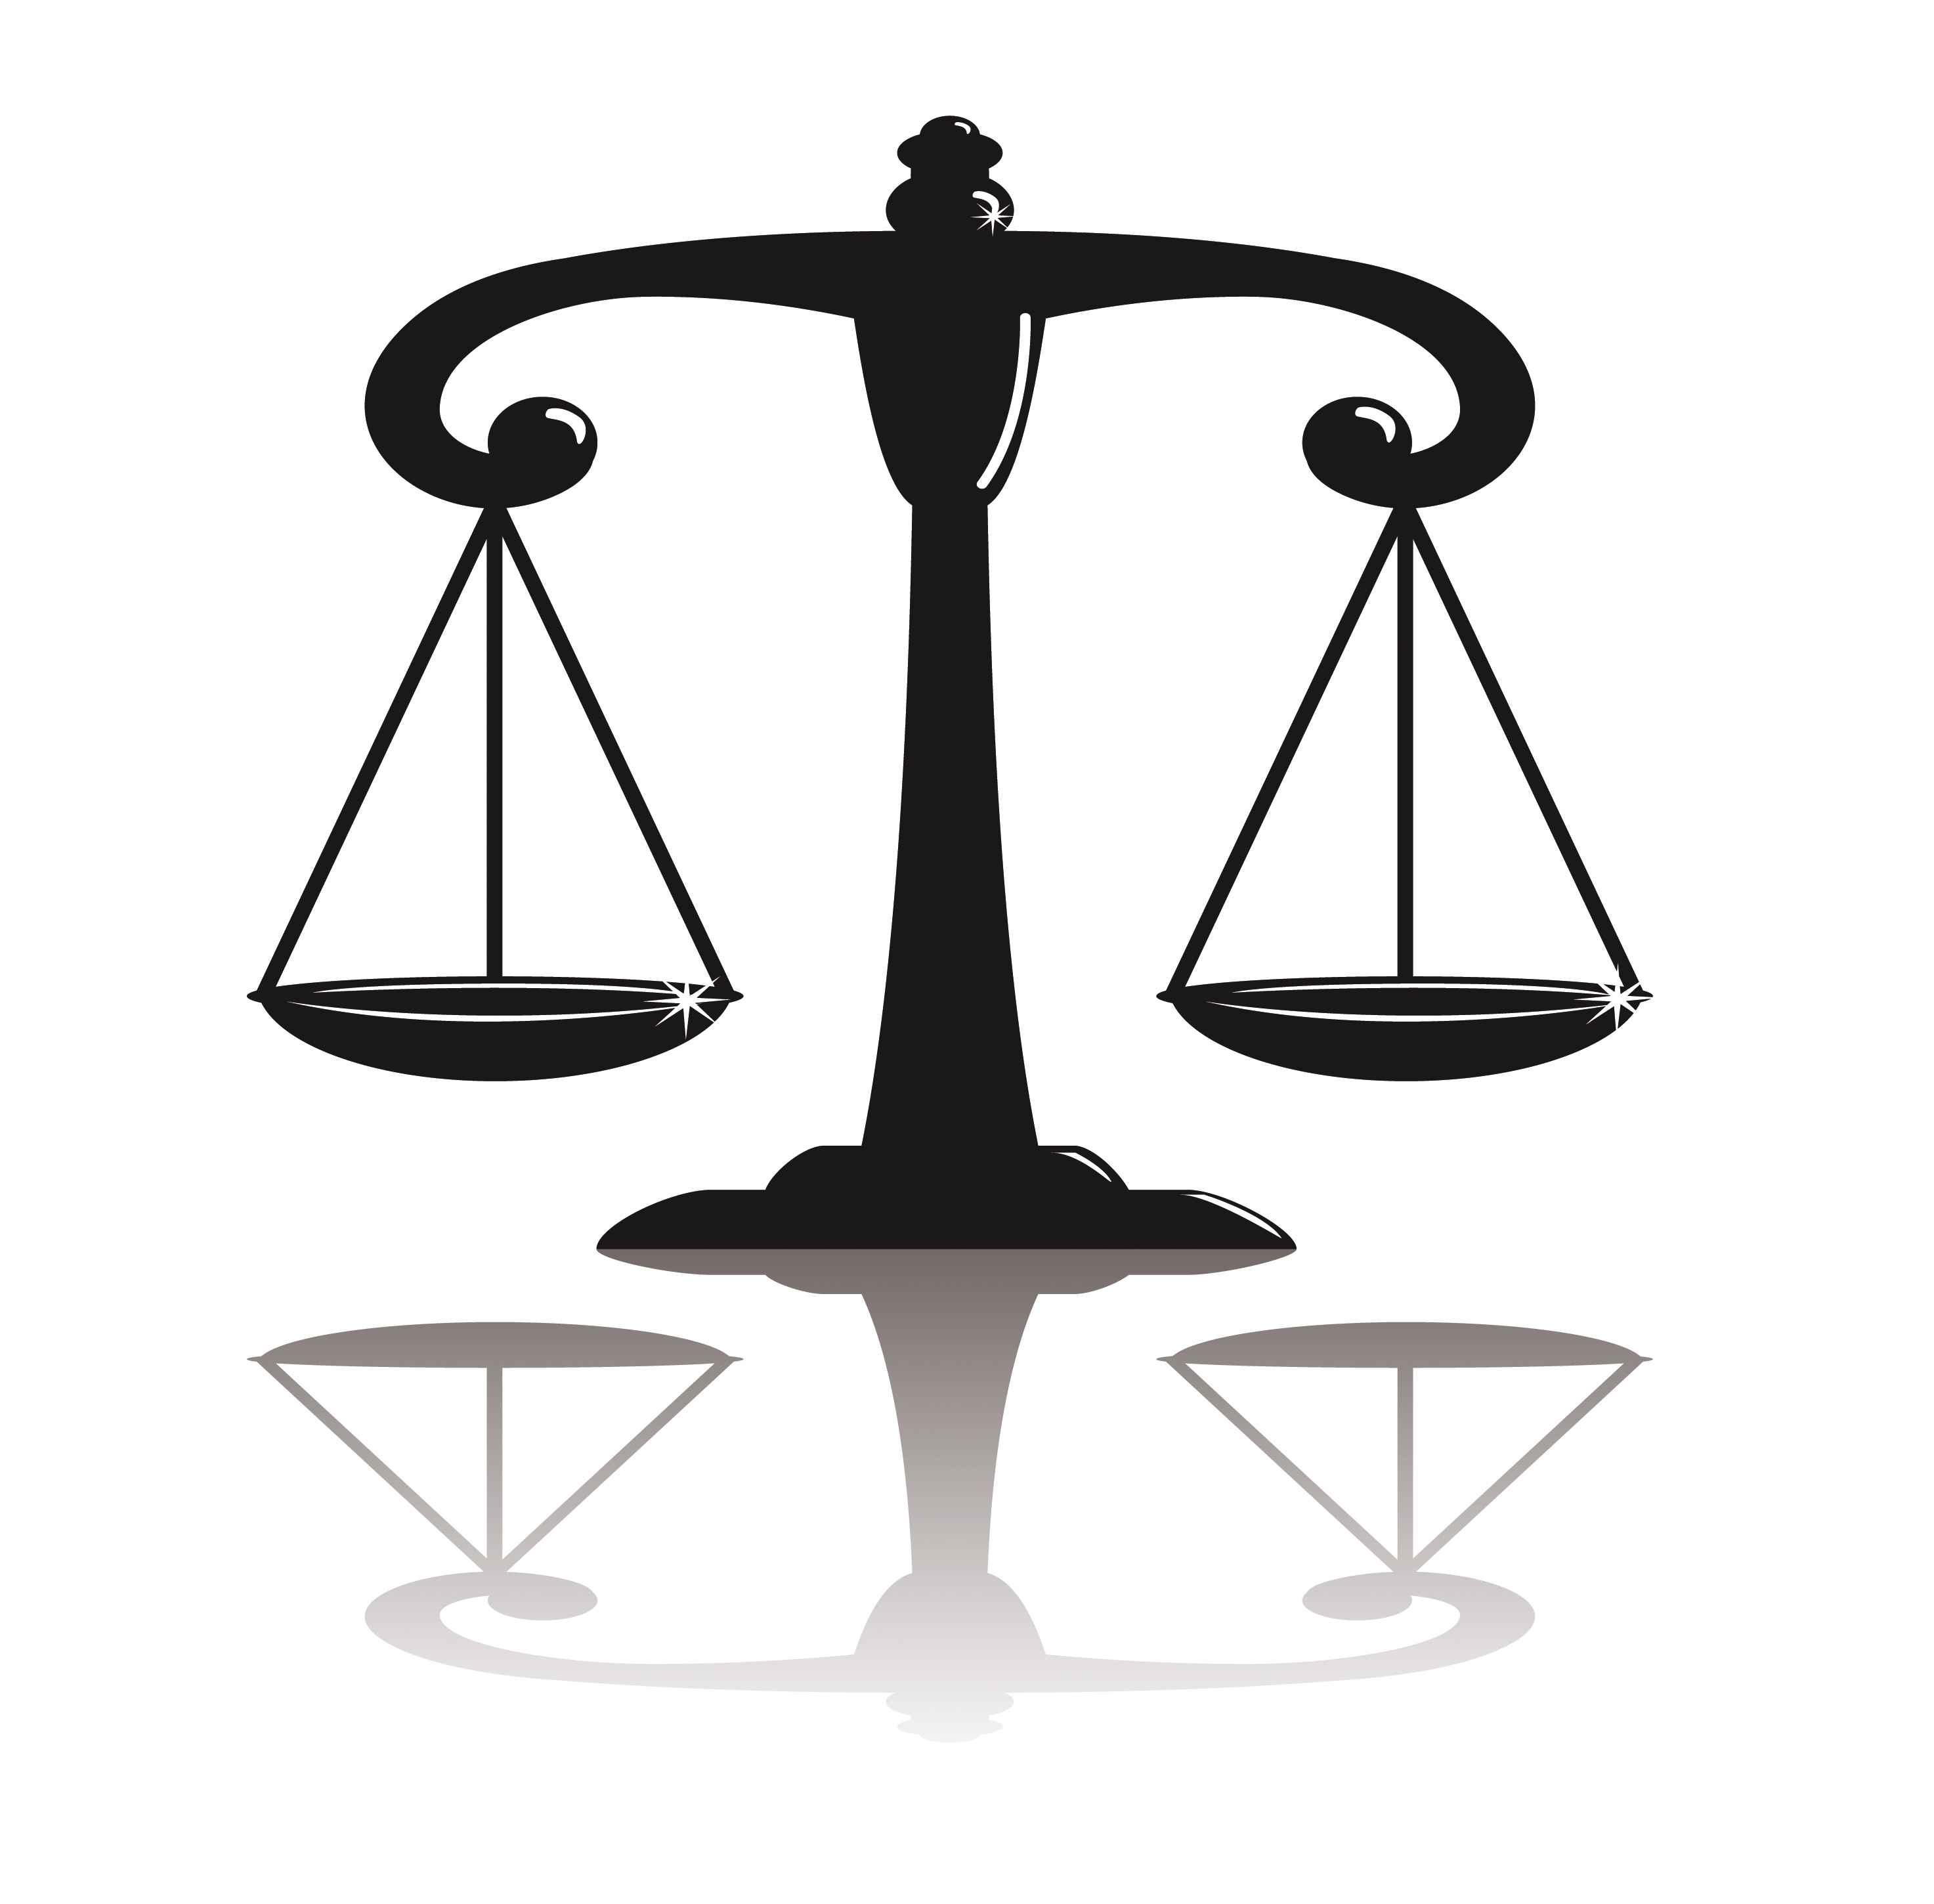 Balance justice clipart free download best balance justice 2946x2900 scales of justice animated clipart kid buycottarizona